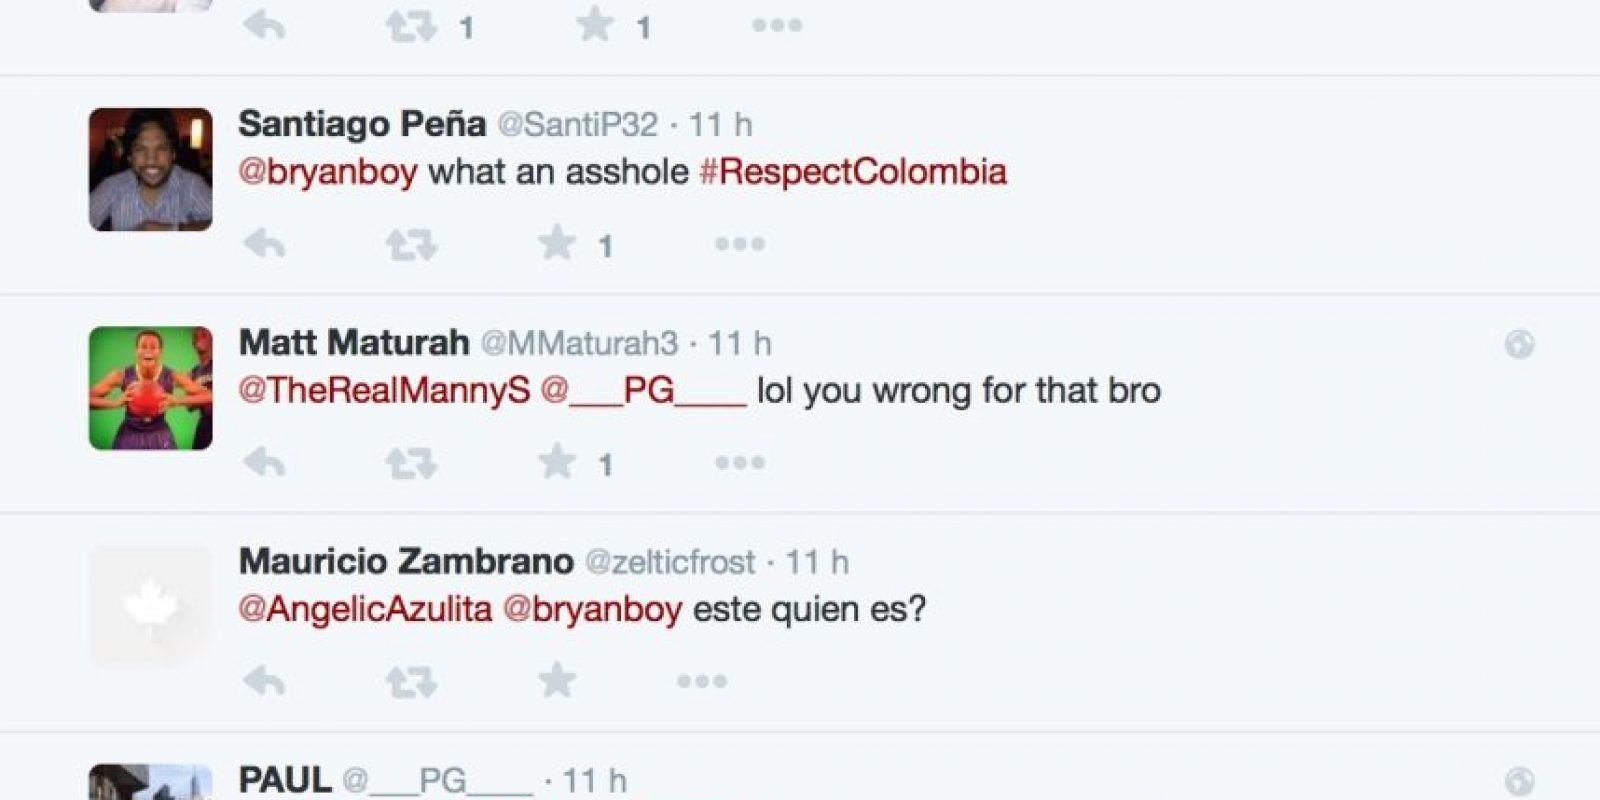 Lo insultaron. Otros le pidieron respeto. Foto:Twitter